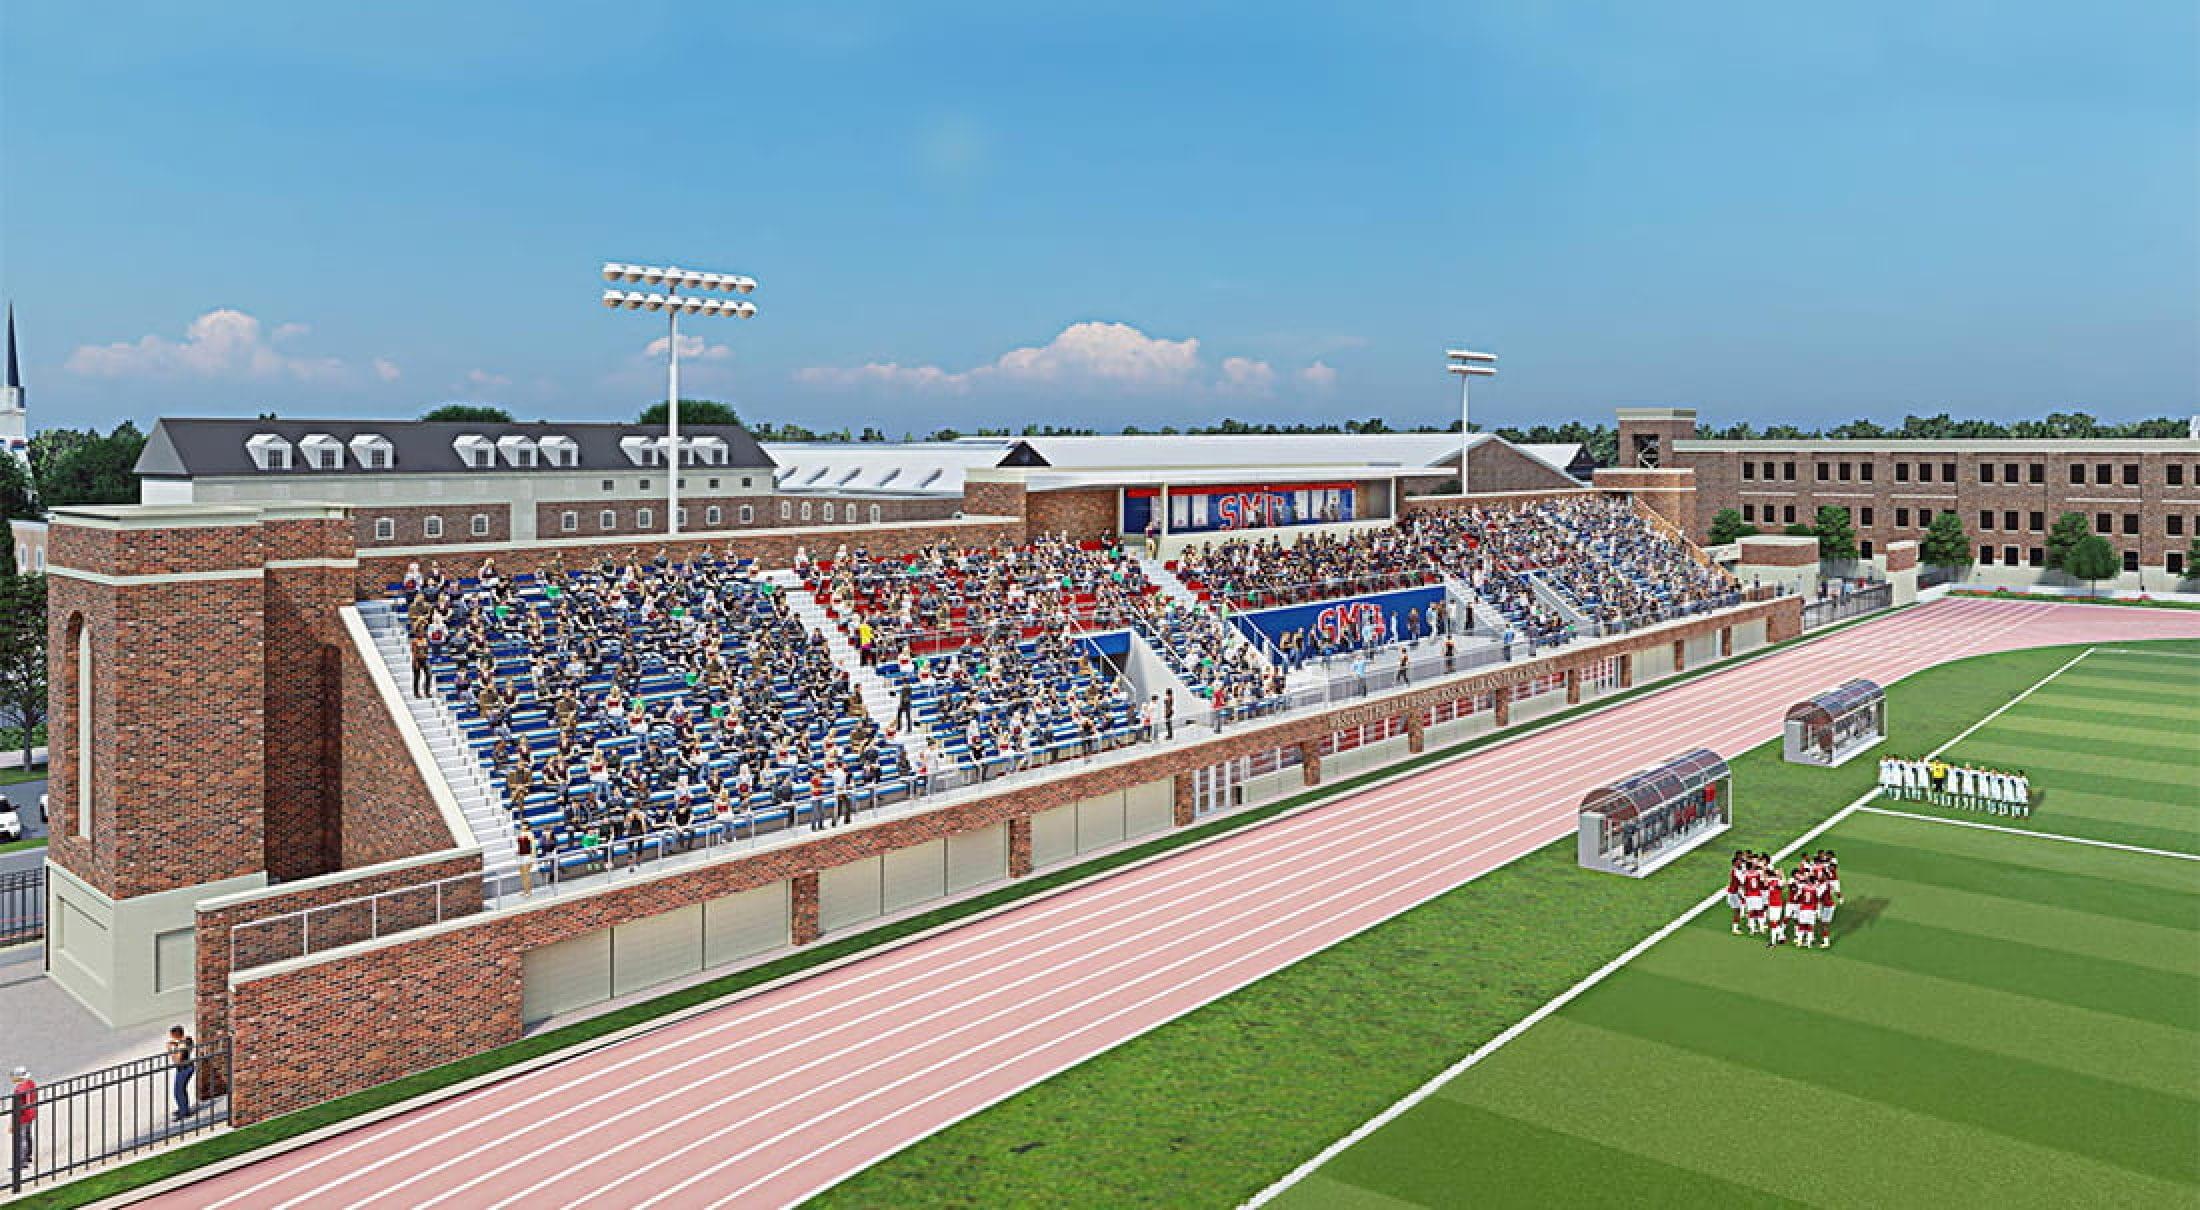 Washburne Soccer and Track Stadium